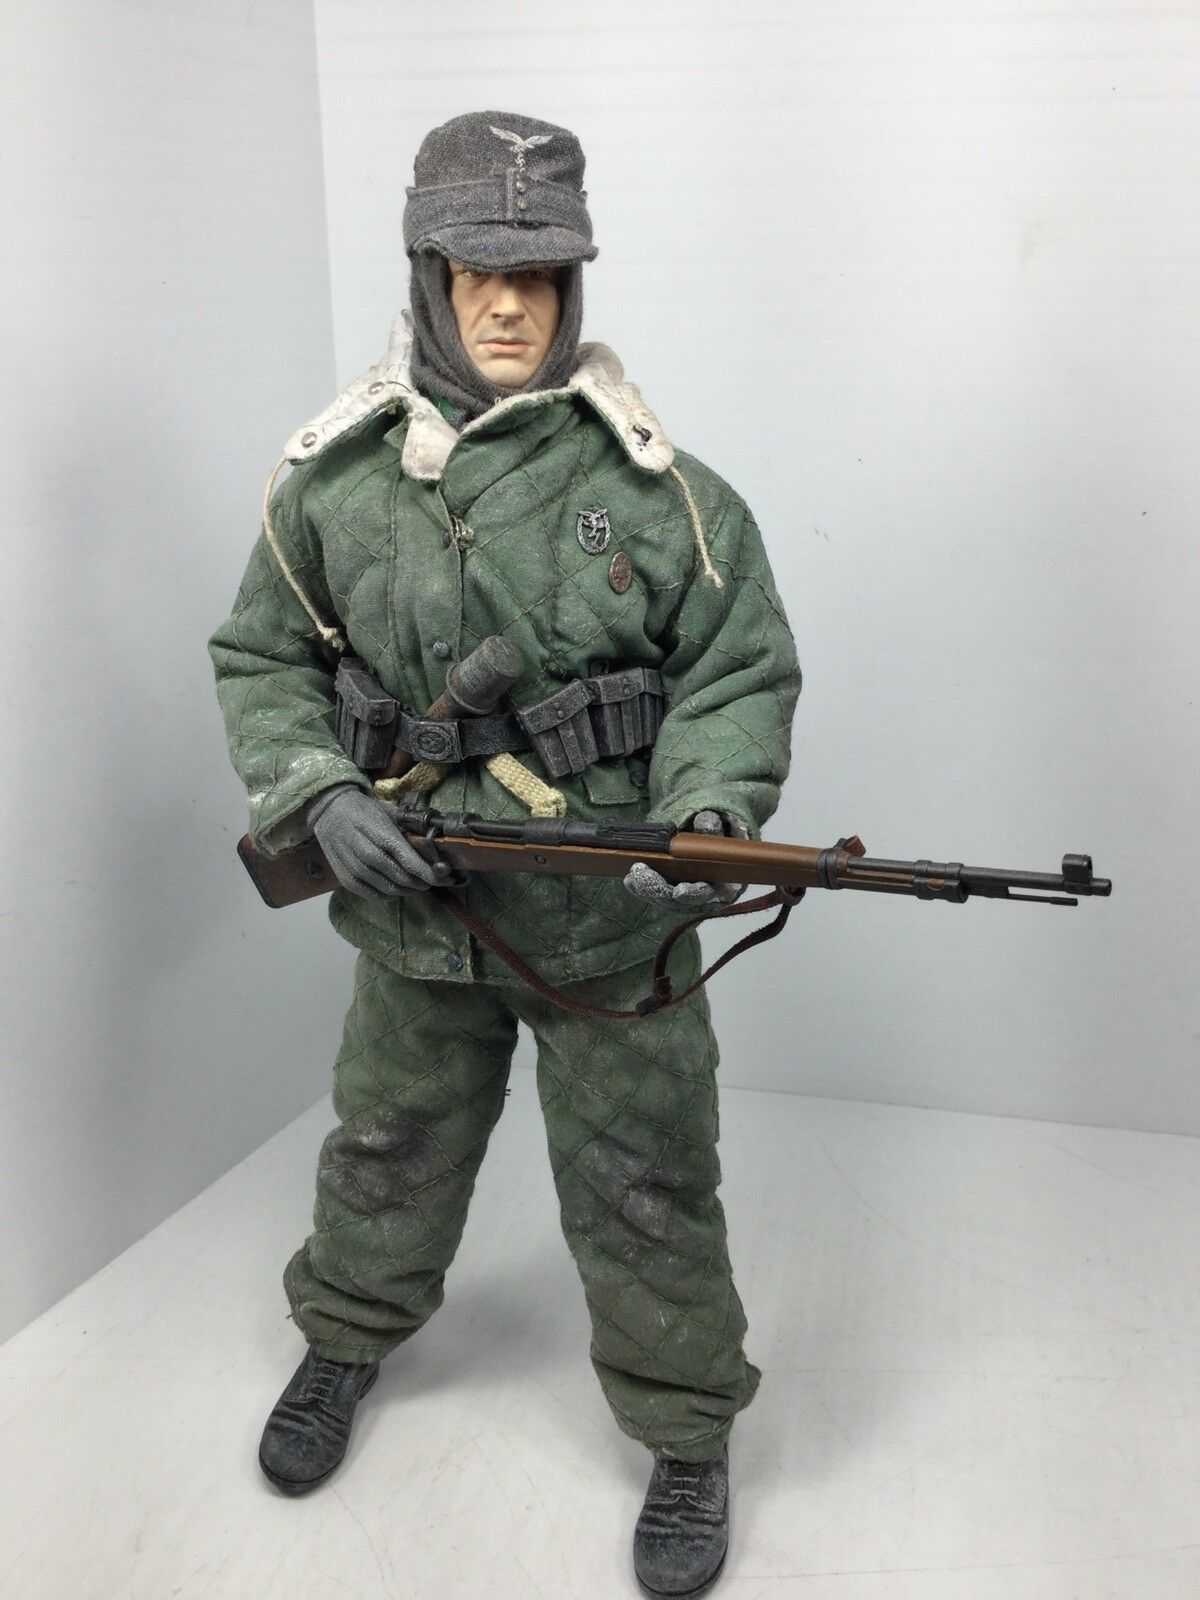 1 6 DRAGON GERMAN LUFTWAFFE FIELD DIV INF SCOUT K-98 EASTERN FRONT DID BBI WW2